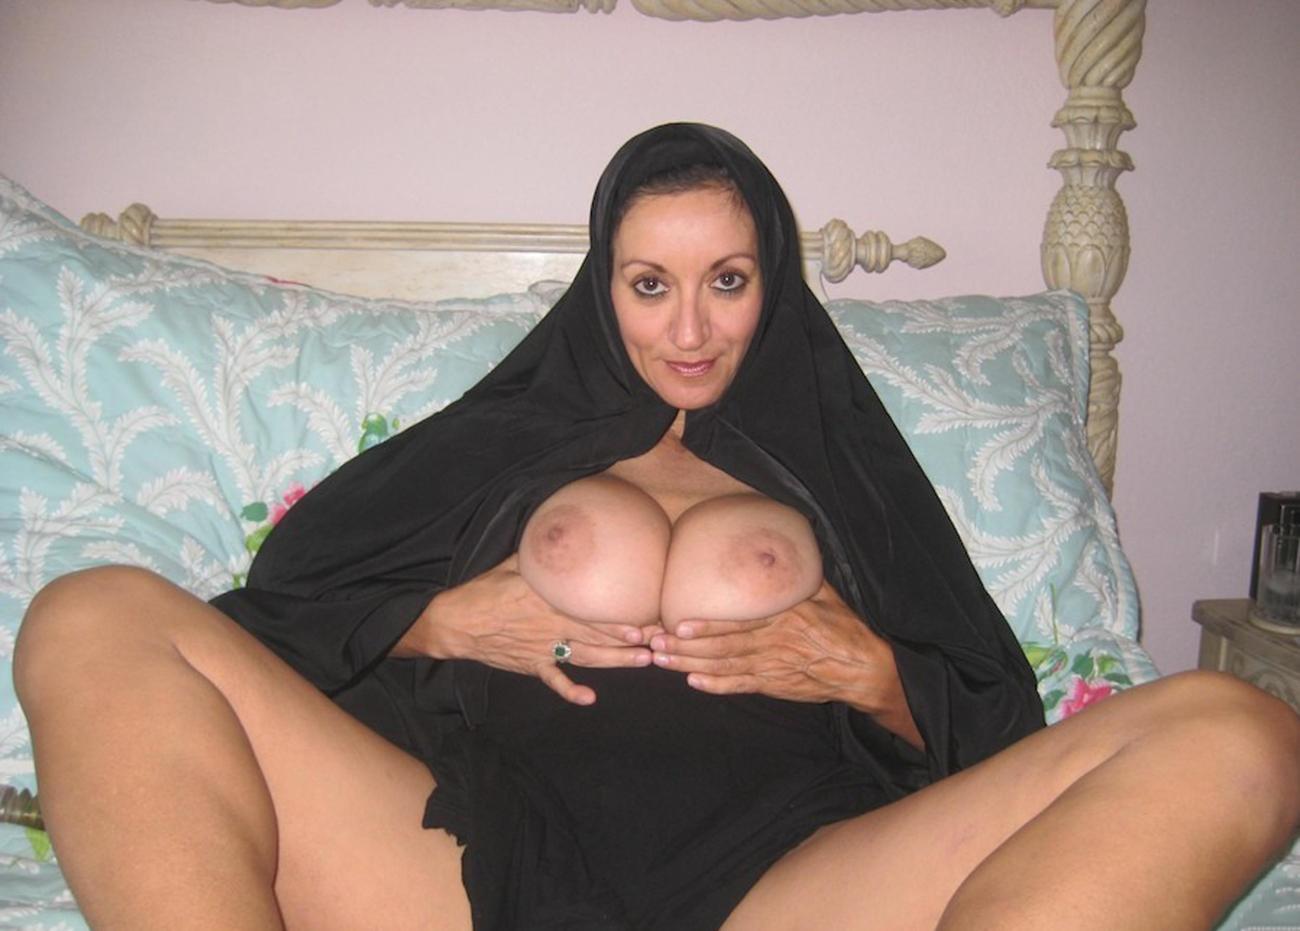 Arab grandpa naked and sex small photo arabic and free sex arab girl